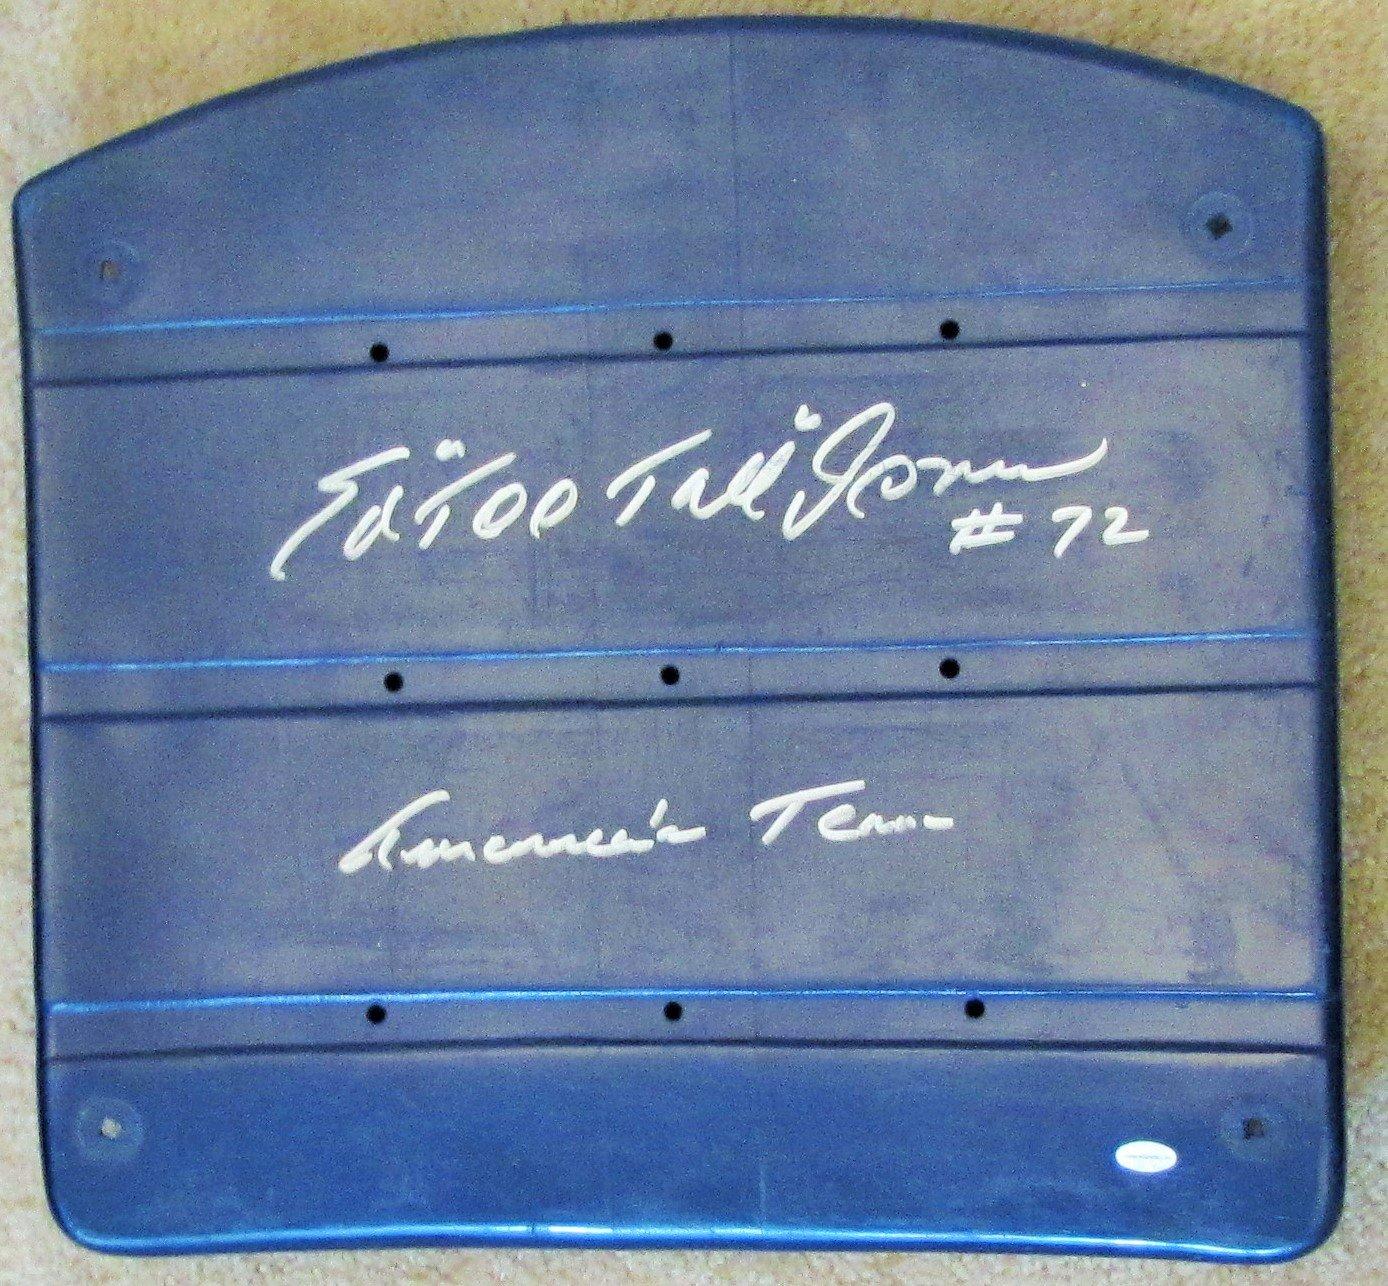 Ed 'Too Tall' Jones Signed Dallas Cowboys Texas Stadium Seat with 'America's Team' Inscription